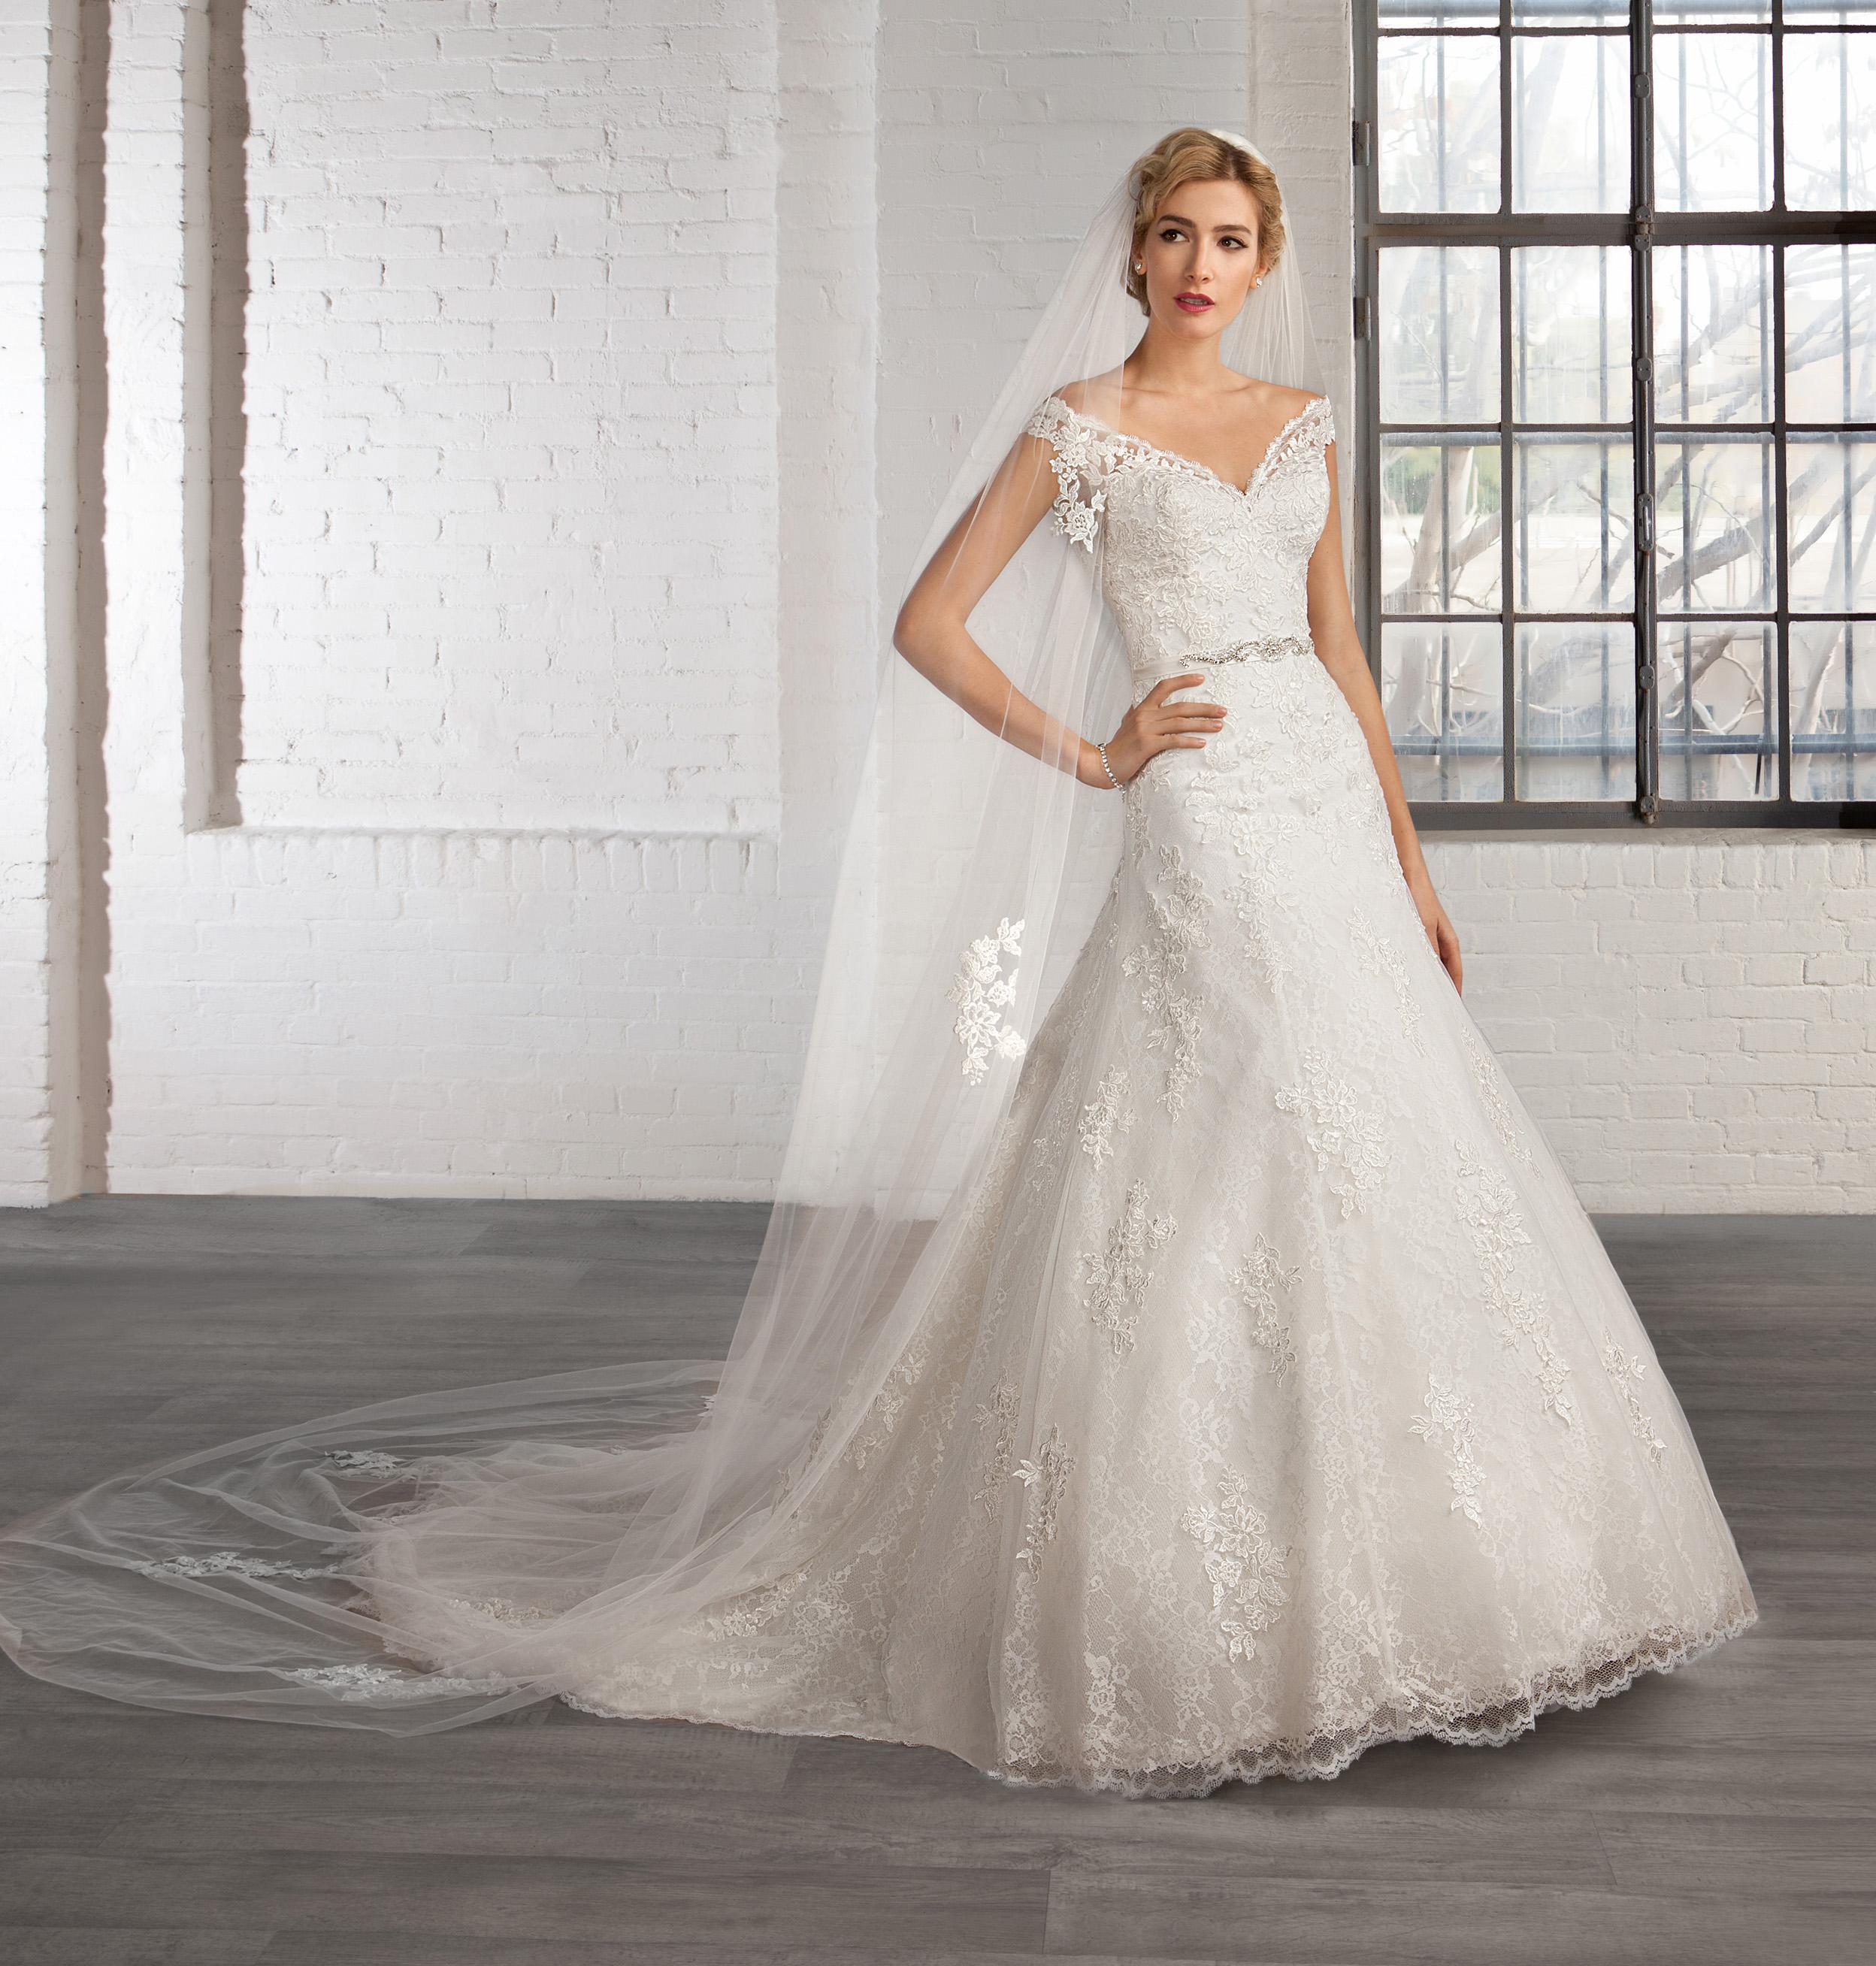 1e2a9f7533c Les robes de mariée 2016 createur robe mariee